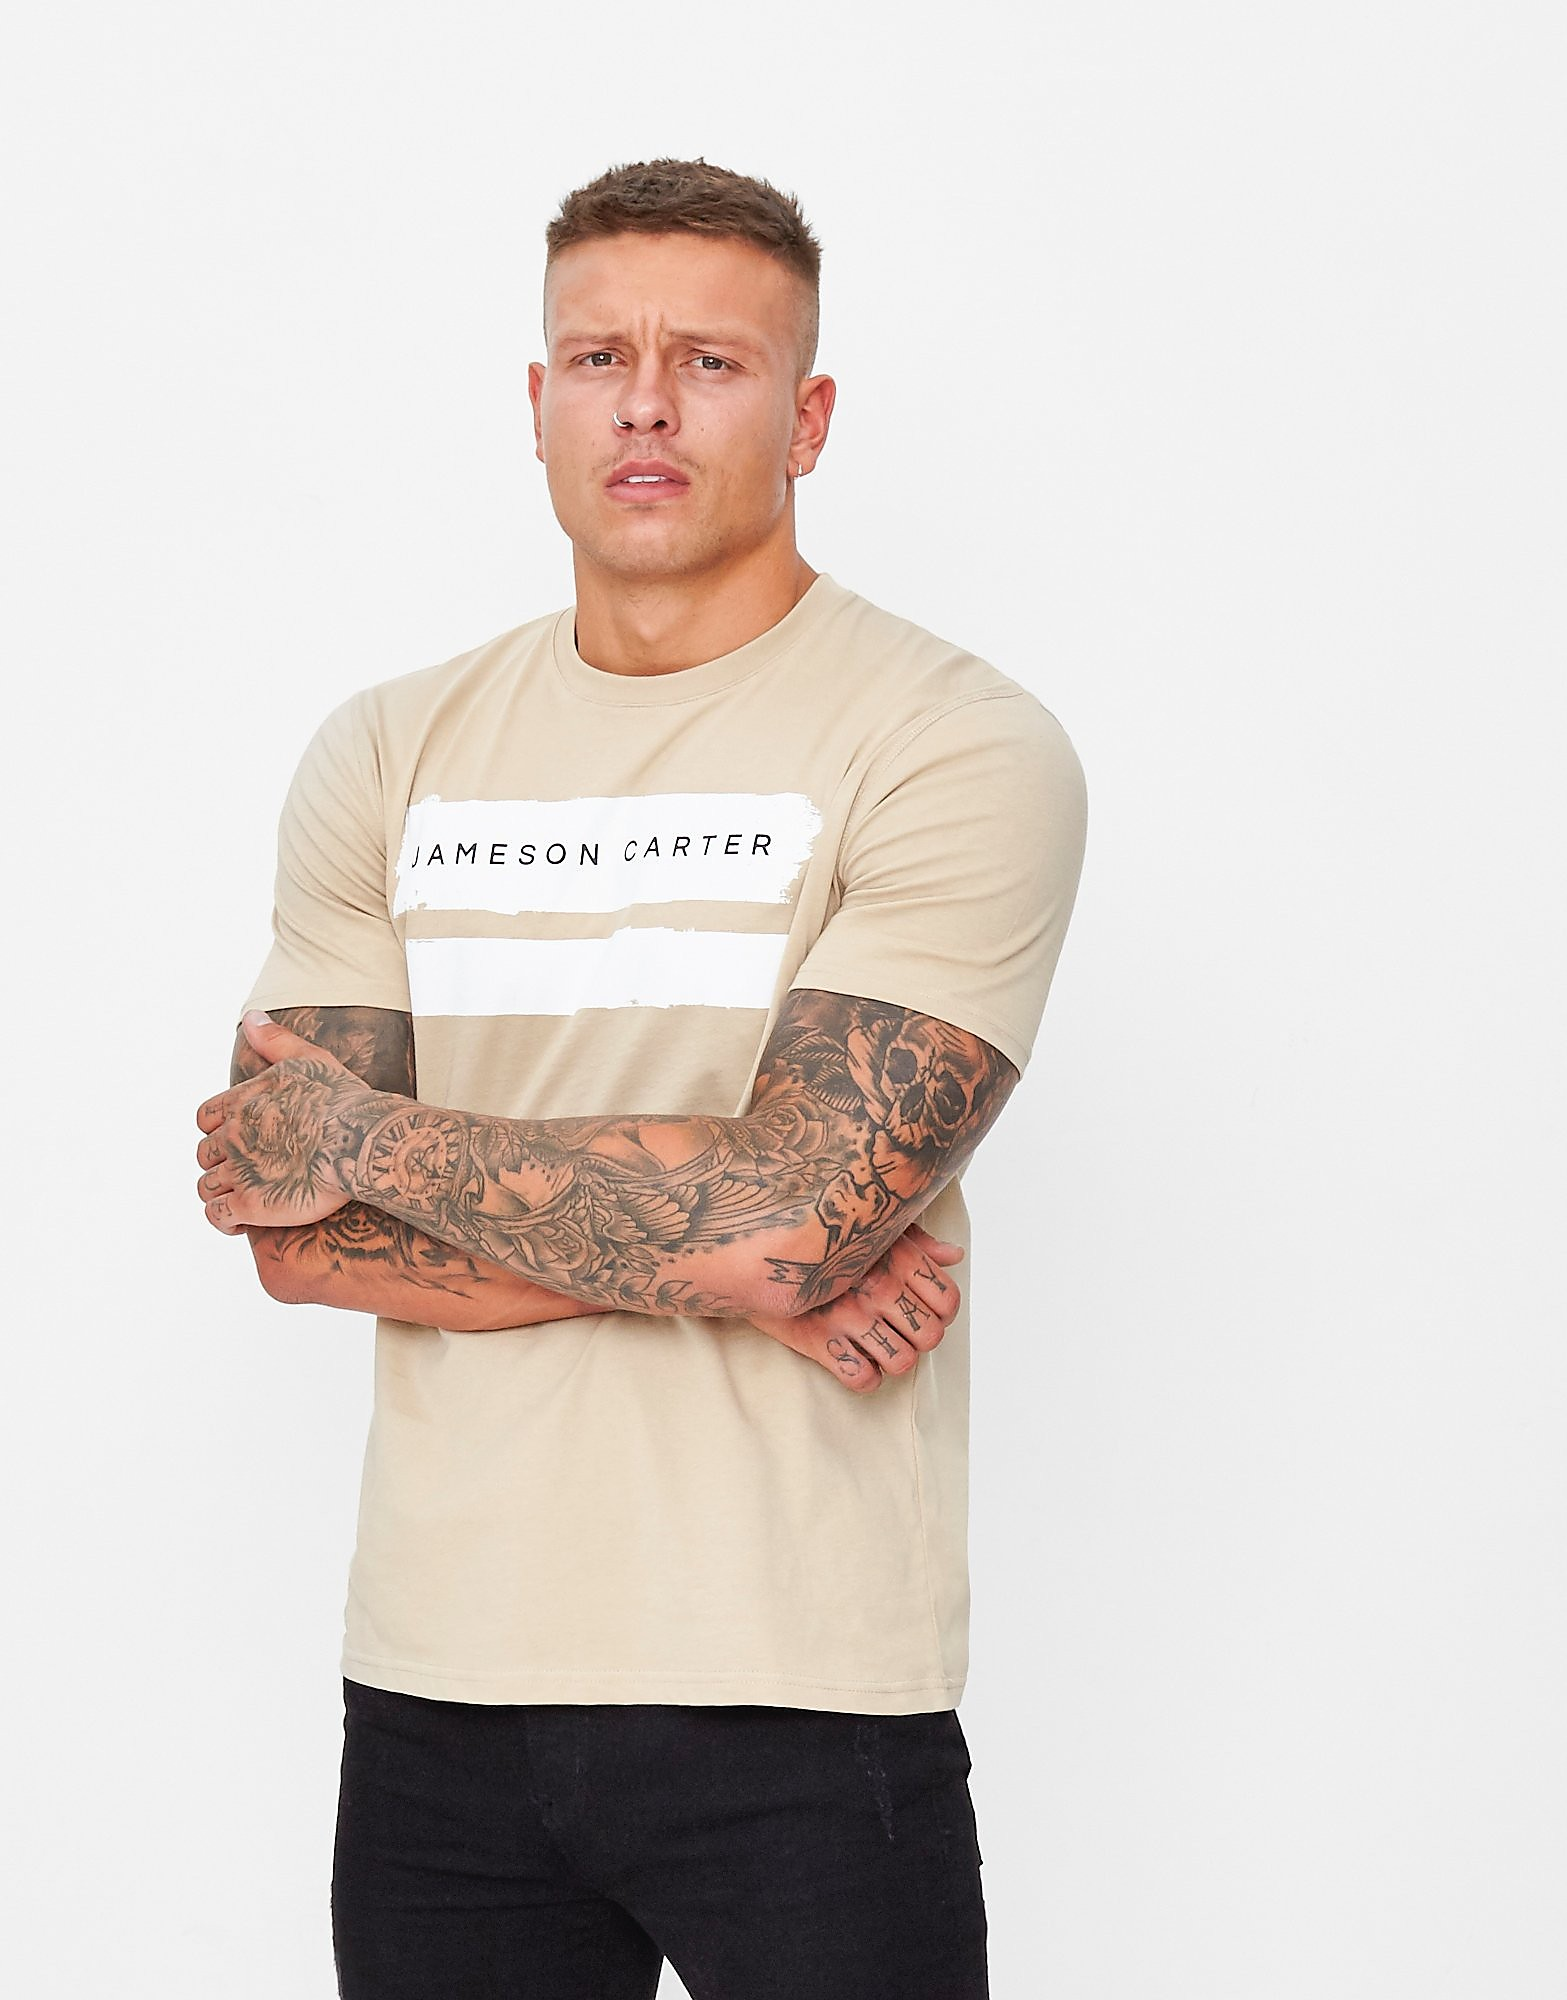 JAMESON CARTER Paint T-Shirt Heren - Stone - Heren